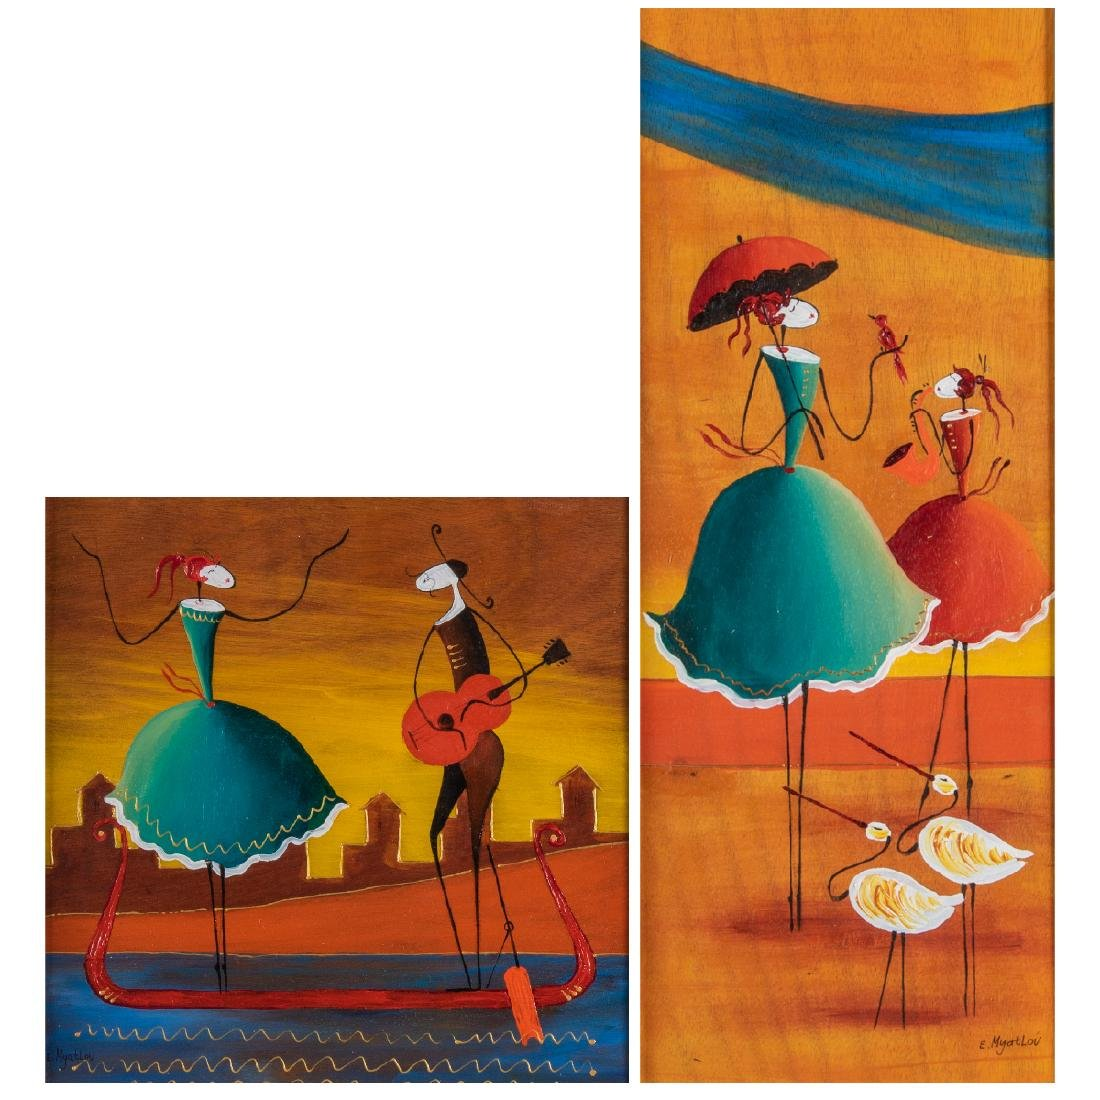 Ester Myatlov (b. 1976) 'Inspiration' and 'Love on a